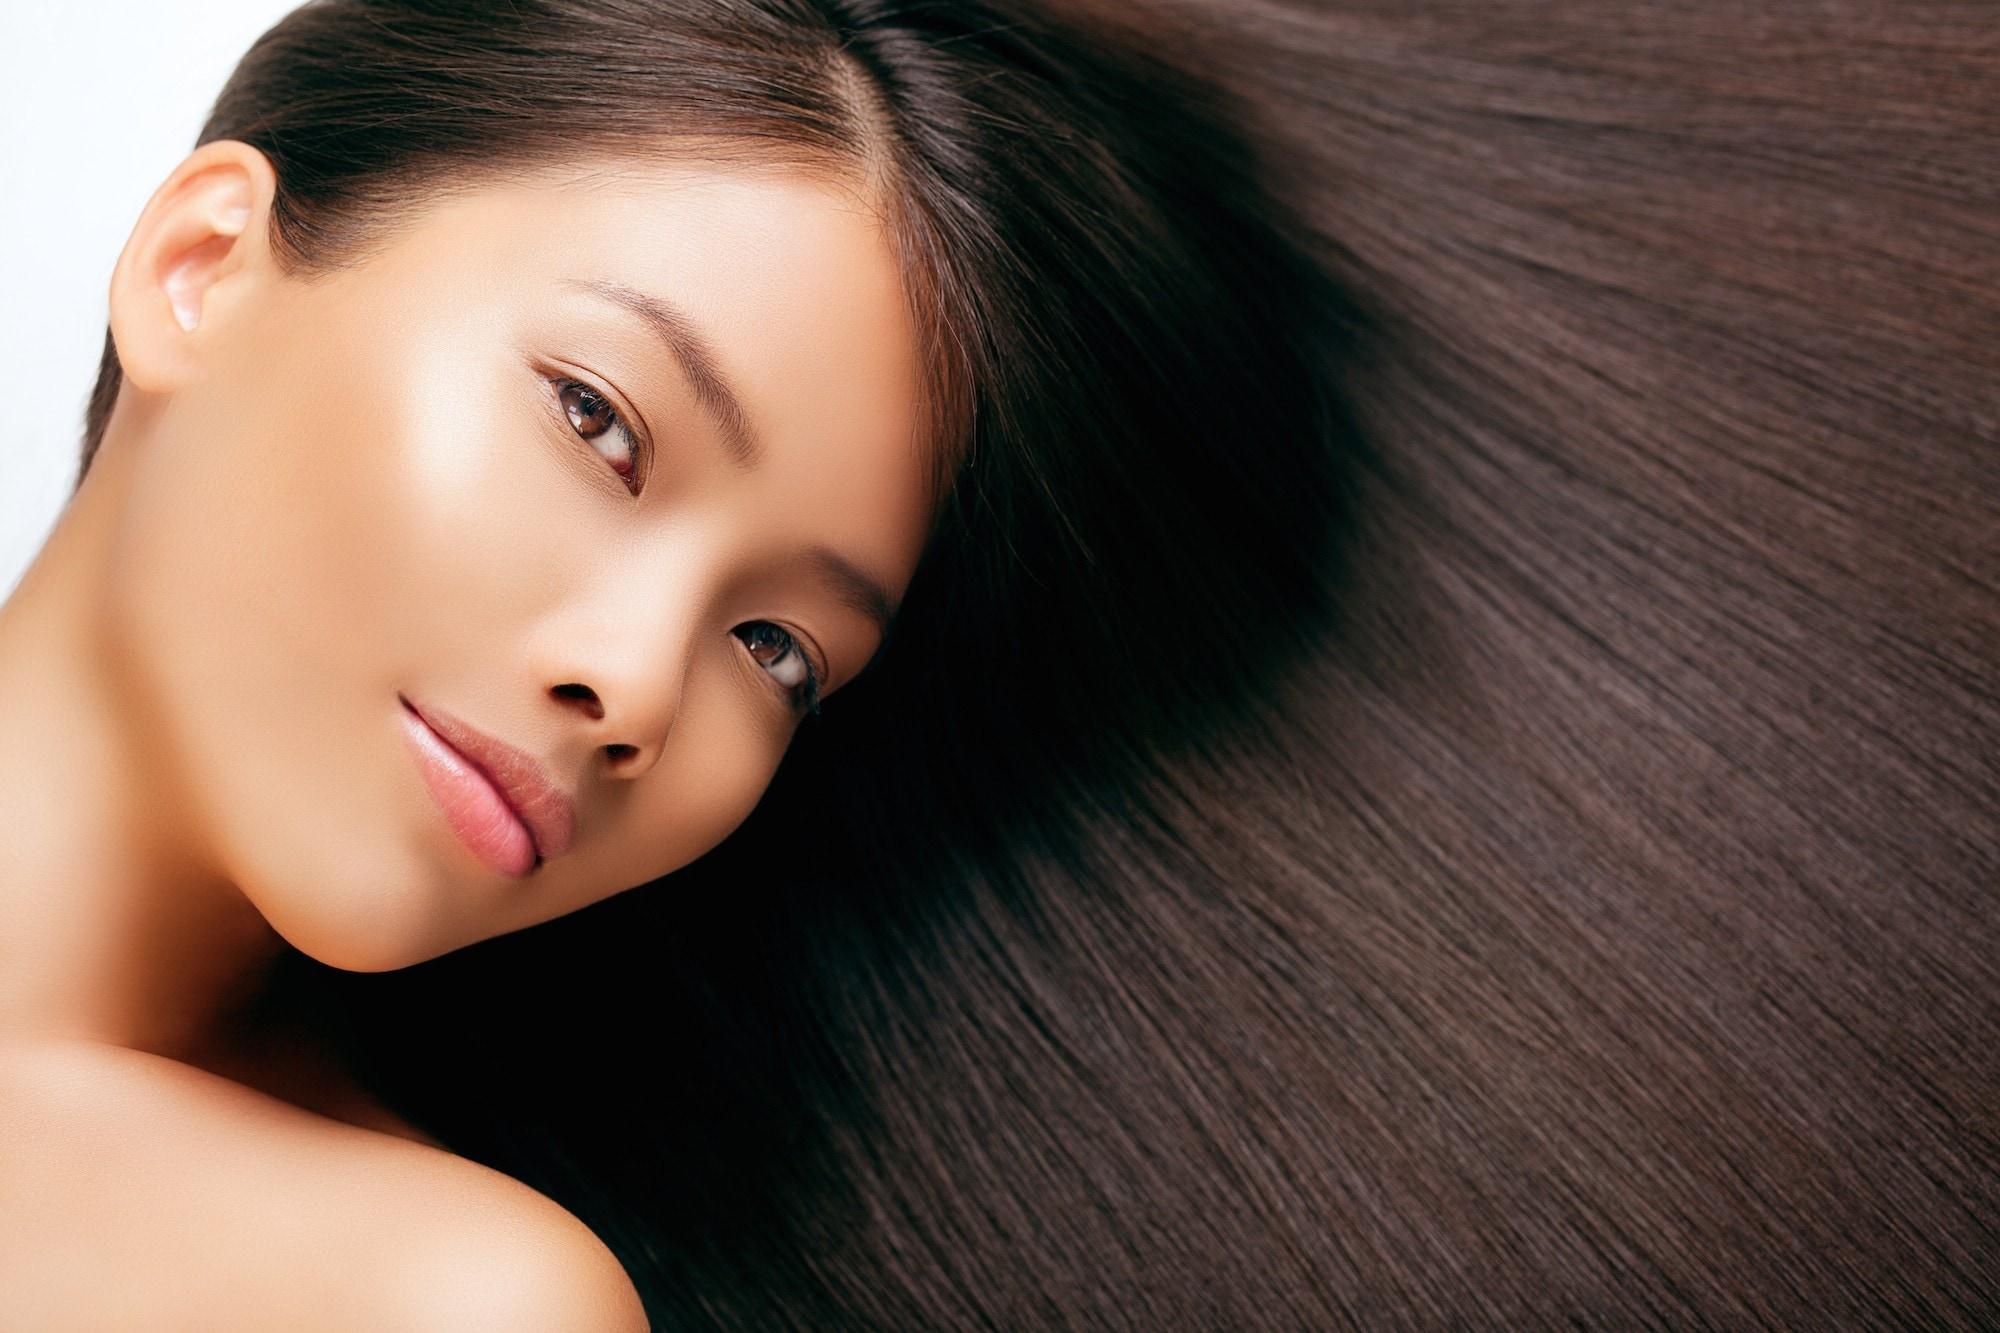 Wanita asia dengan rambut lurus dan indah